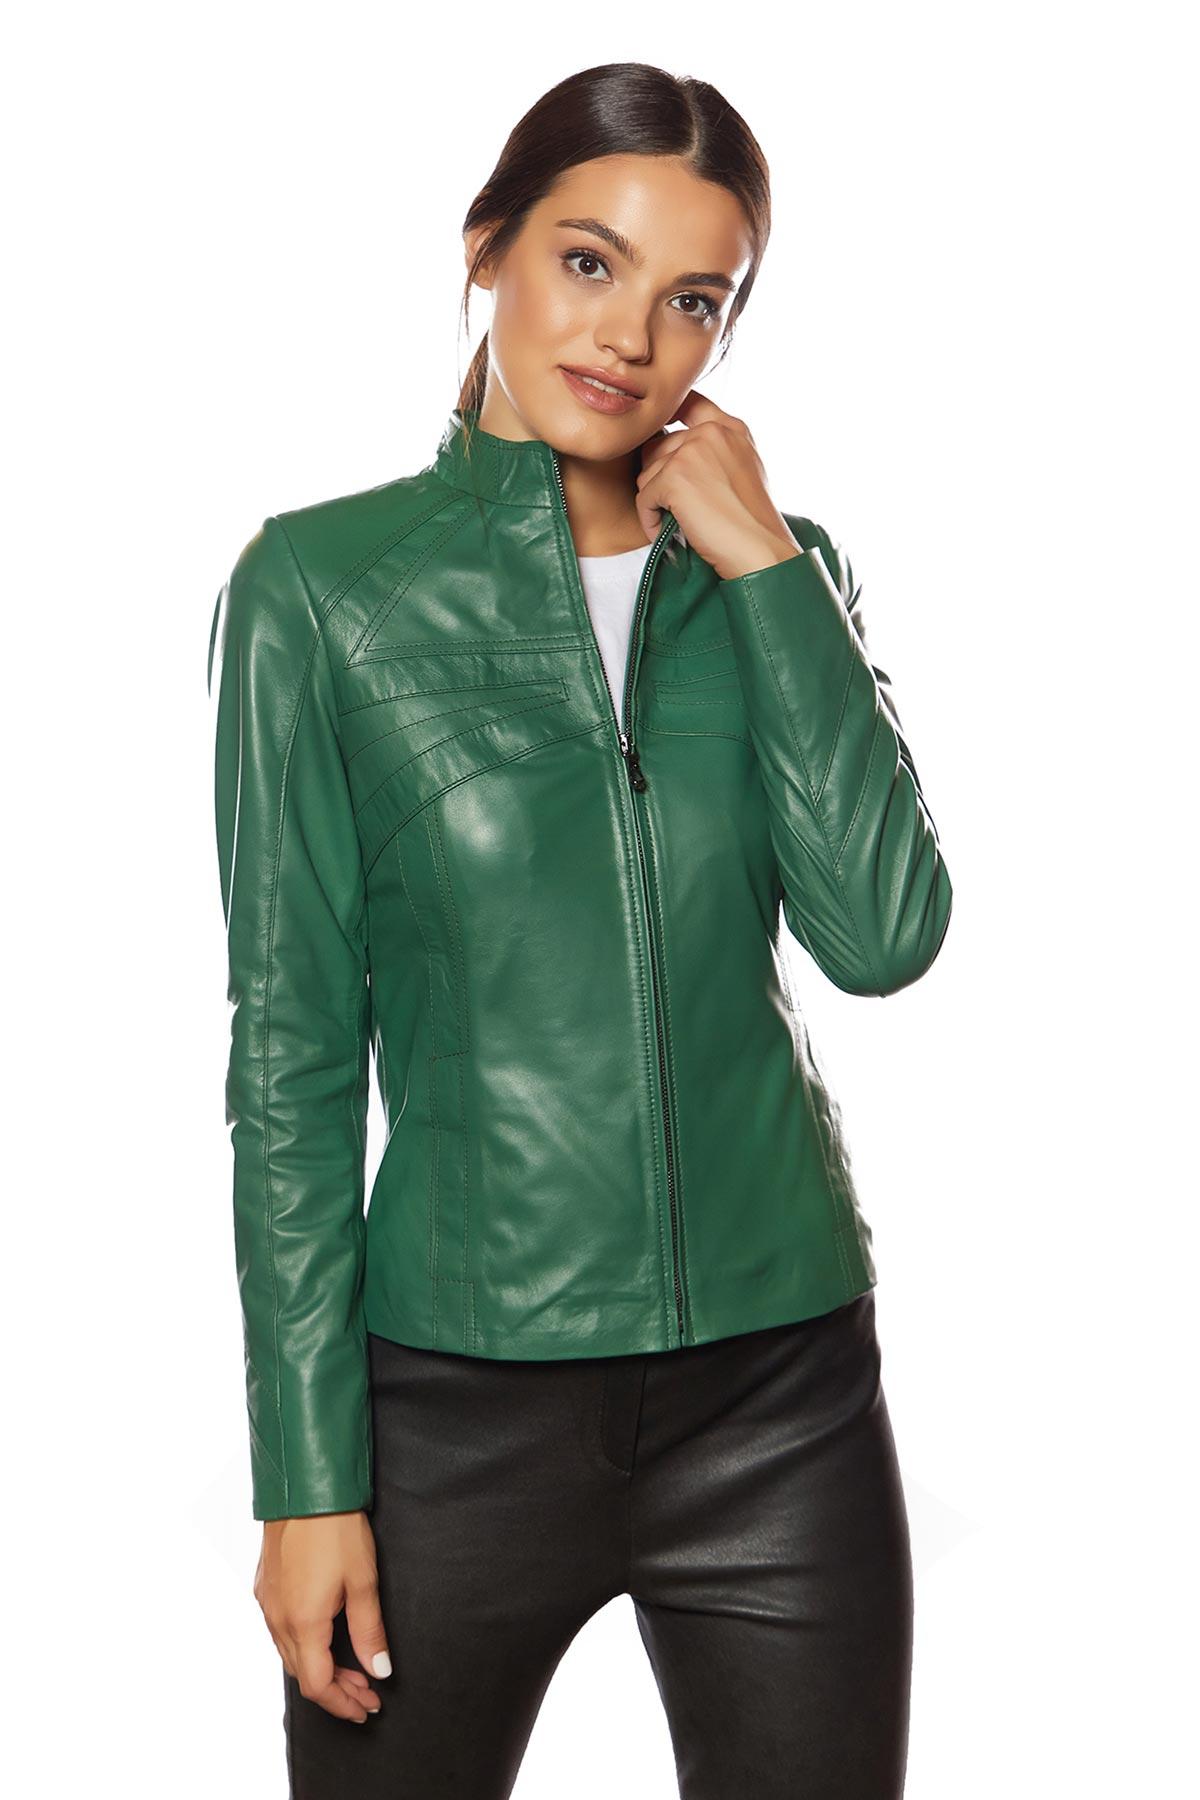 leather works jacket